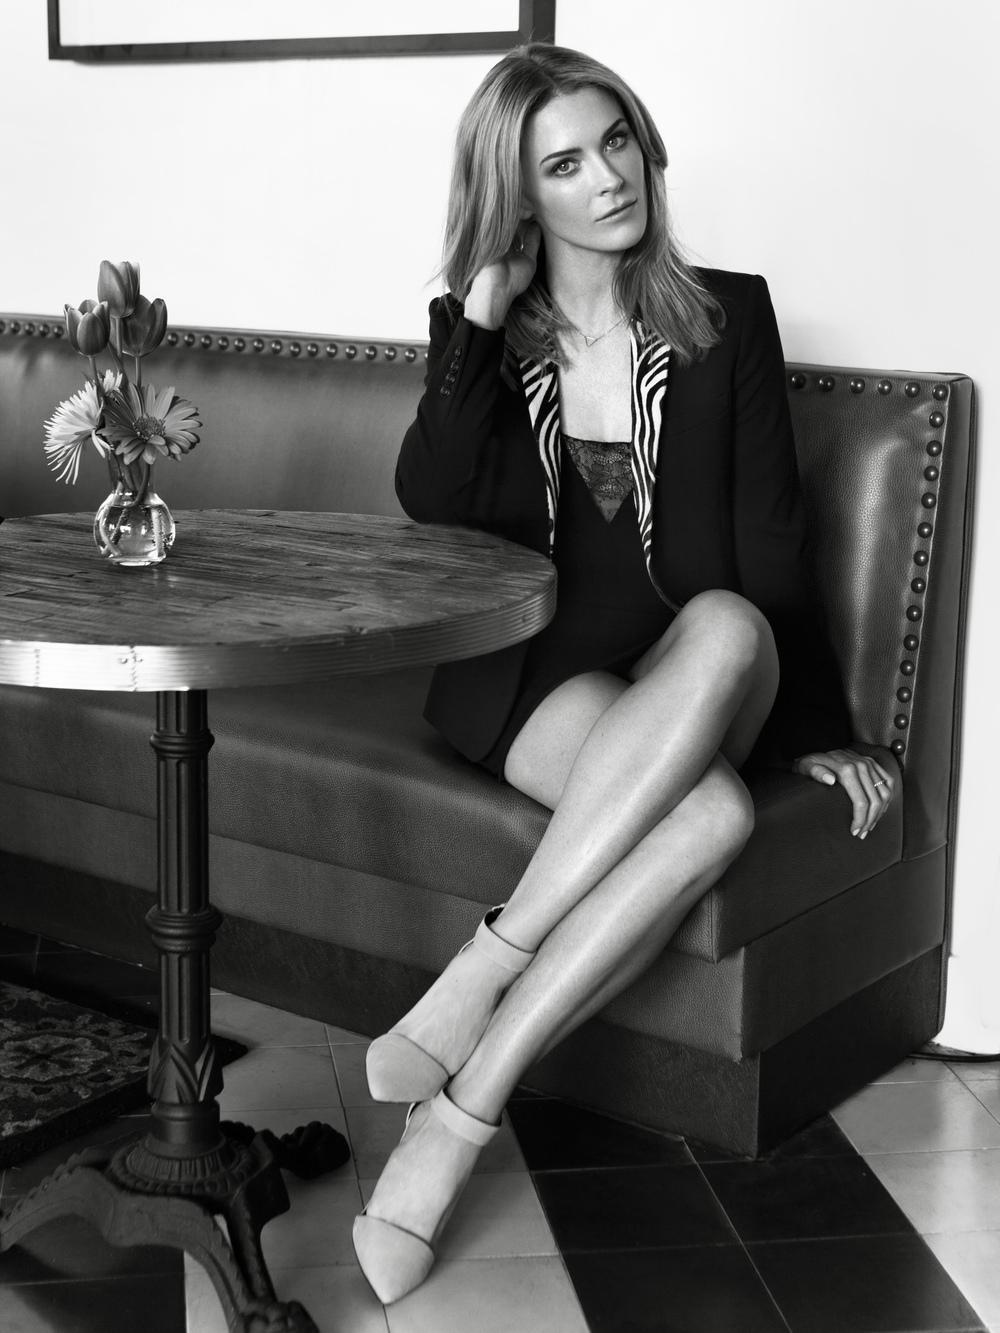 Bridget Regans Hot Legs